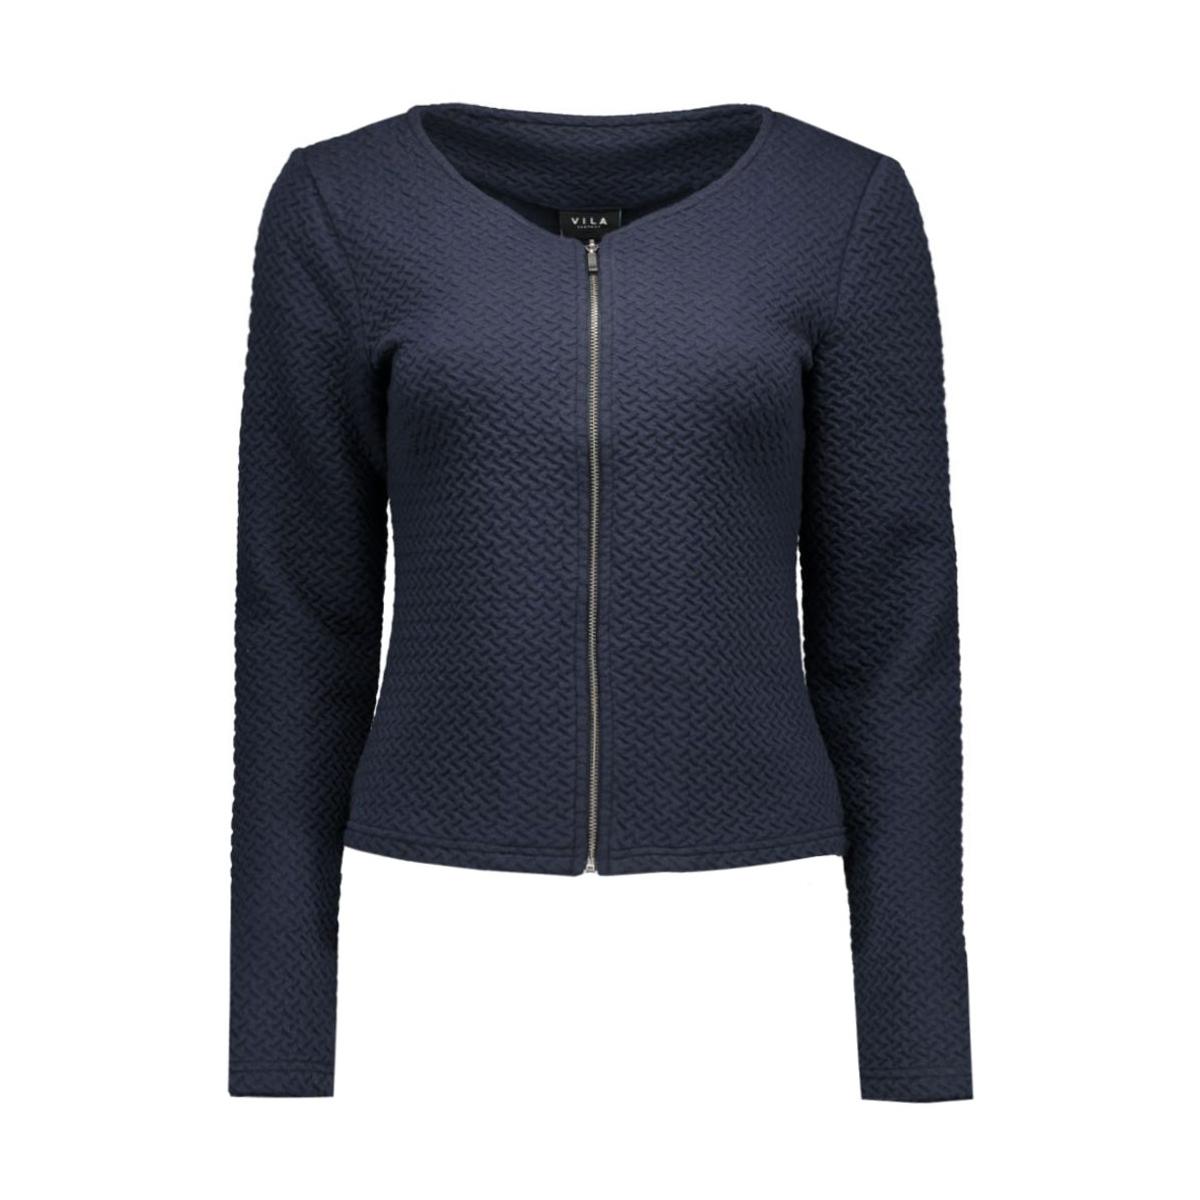 vinaja new short jacket-noos 14032657 vila vest total eclipse